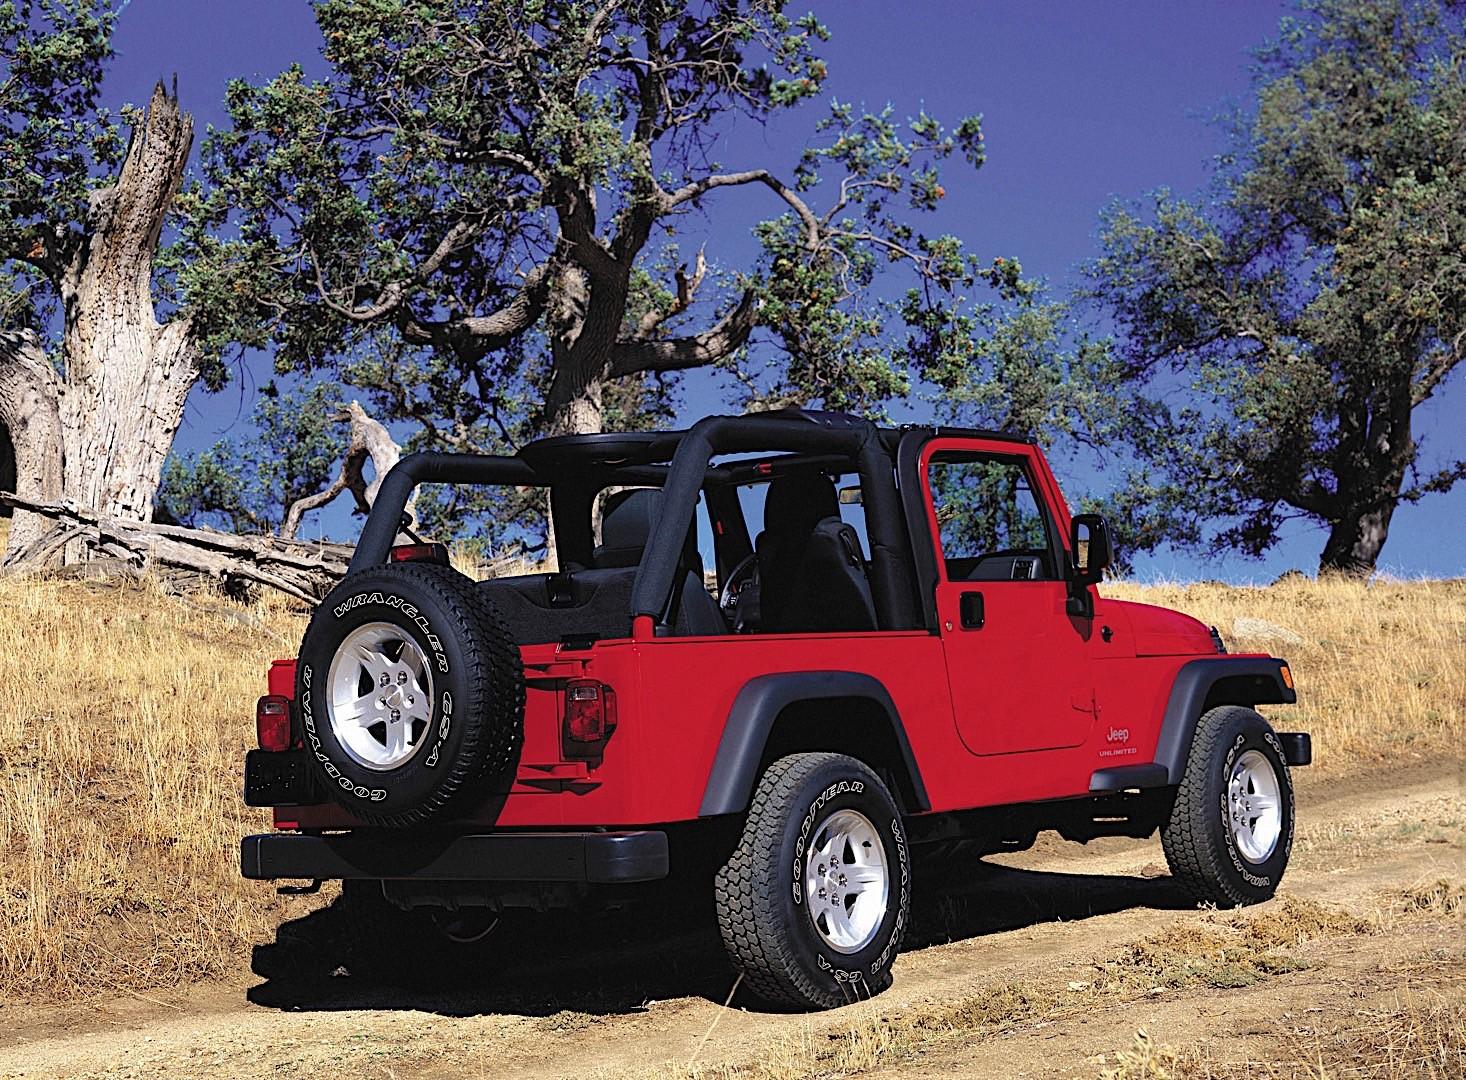 Grand Cherokee Altitude >> JEEP Wrangler specs & photos - 1996, 1997, 1998, 1999, 2000, 2001, 2002, 2003, 2004, 2005, 2006 ...